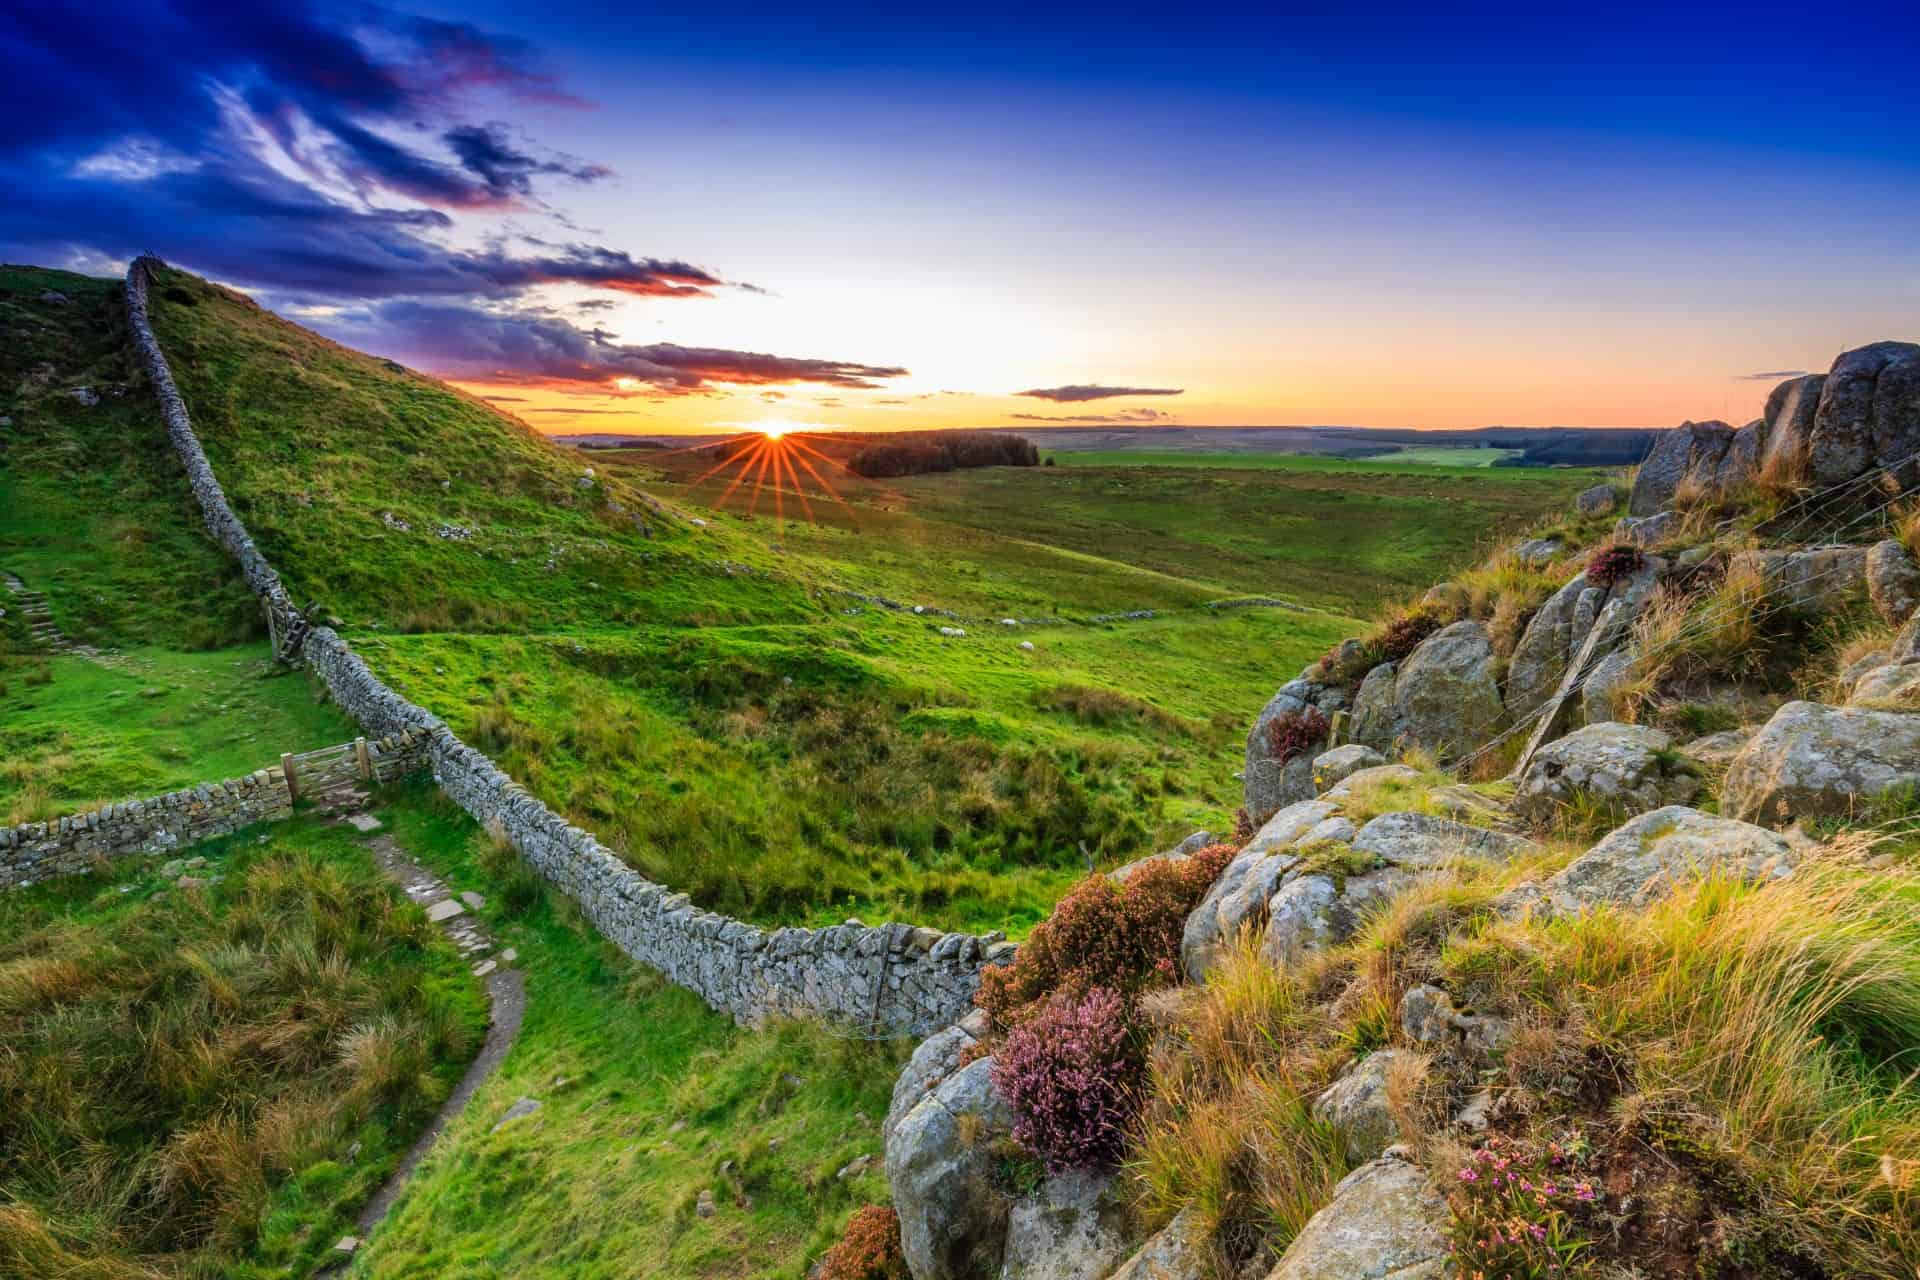 Hadrian's Wall in Northumberland, England